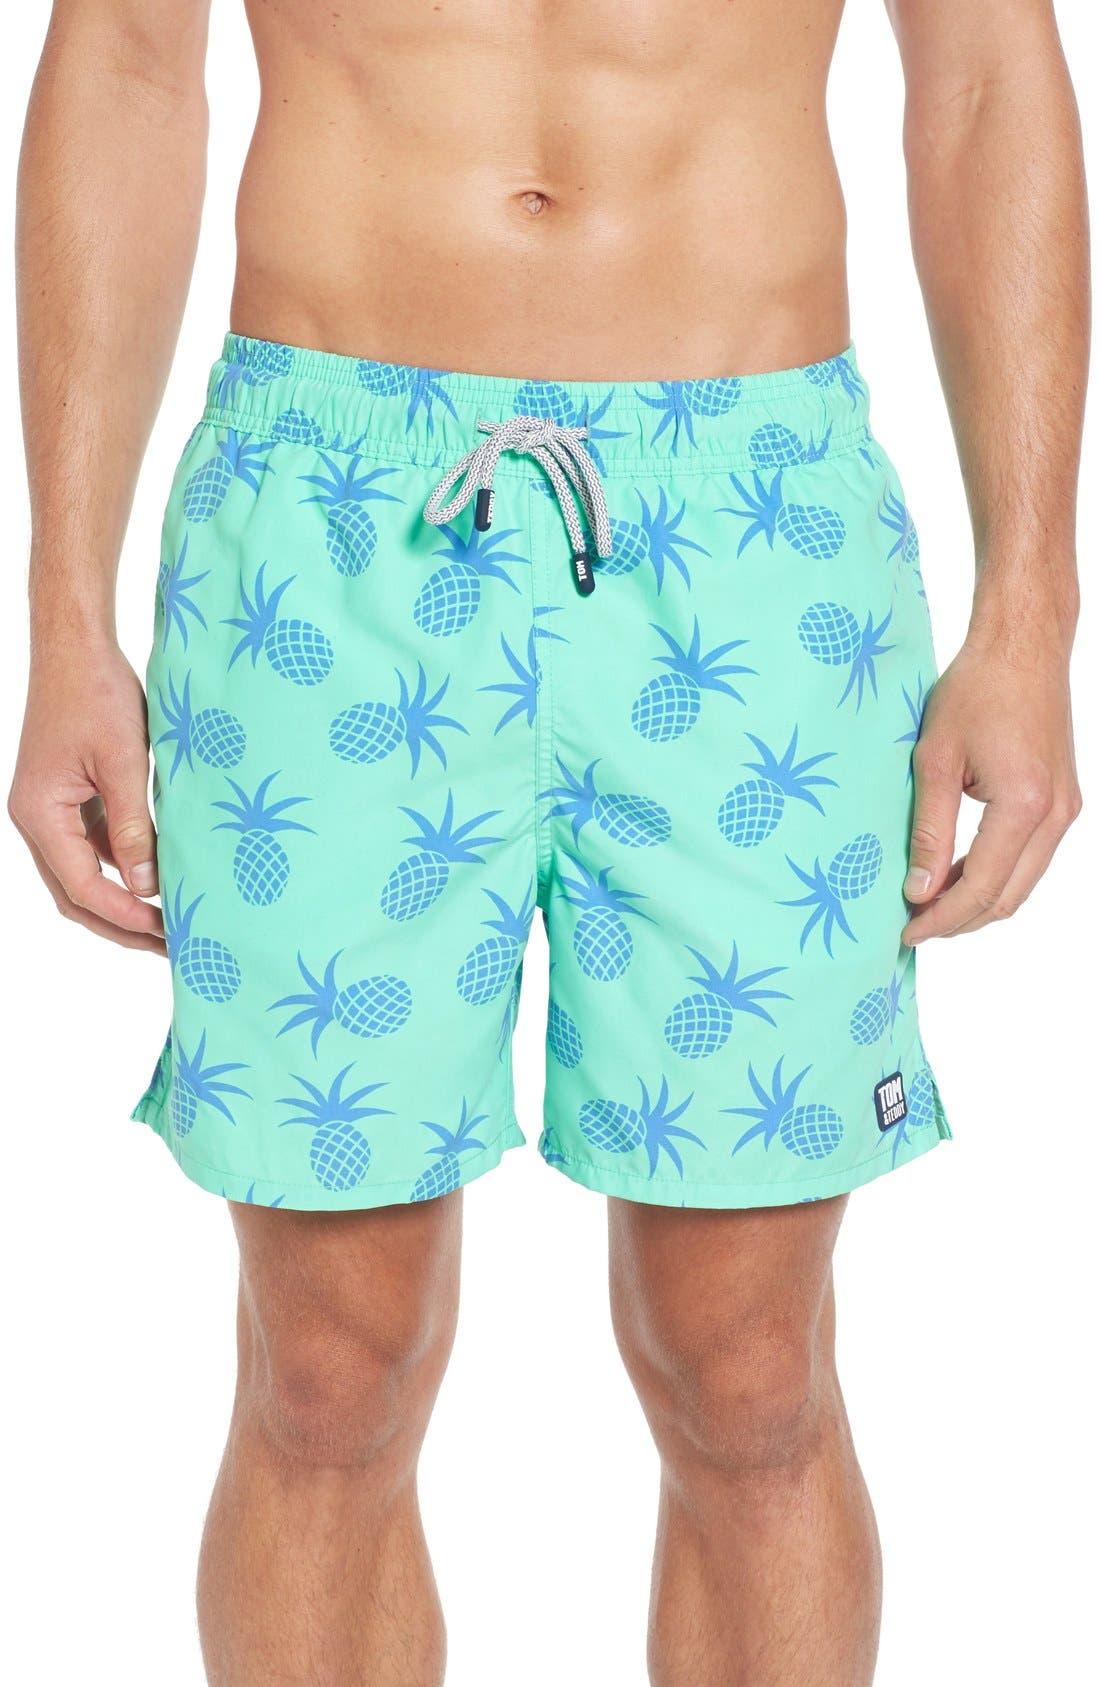 Pineapple Print Swim Trunks,                         Main,                         color,